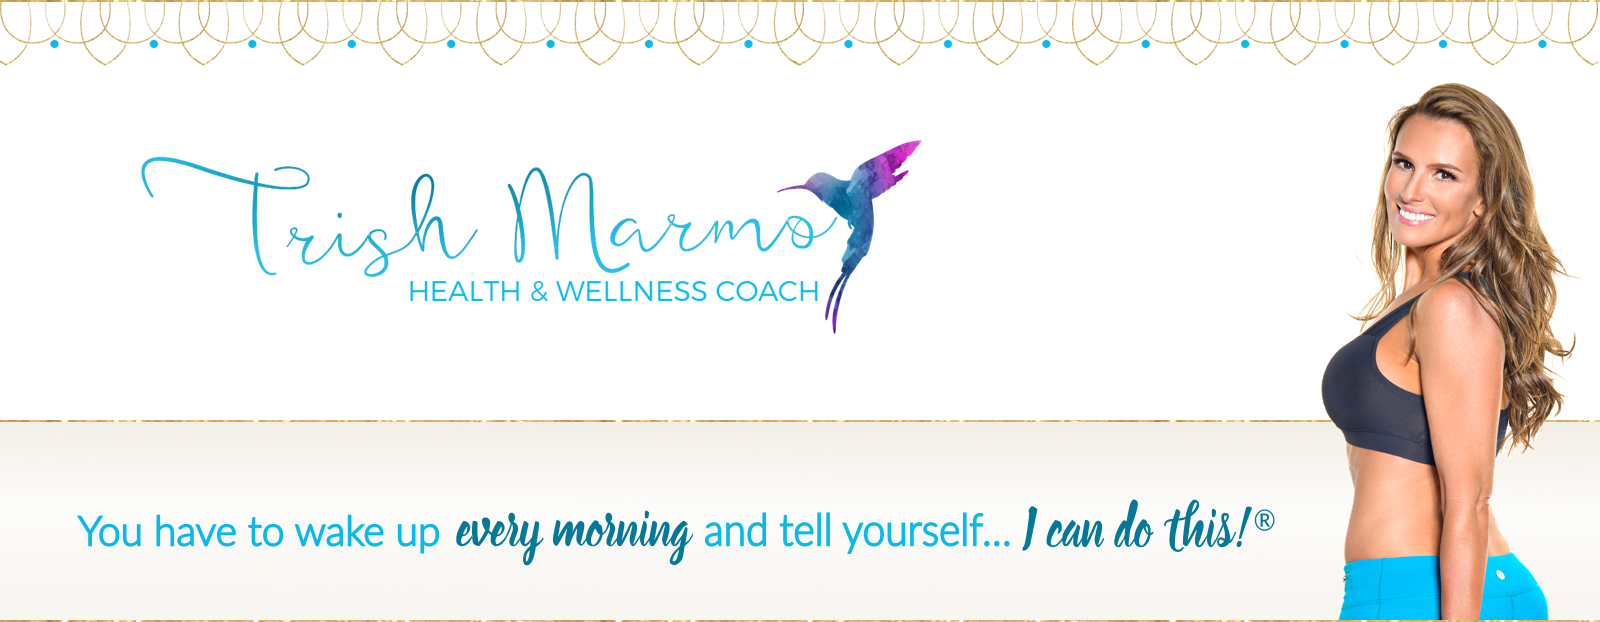 Trish Marmo, Health & Wellness Coach